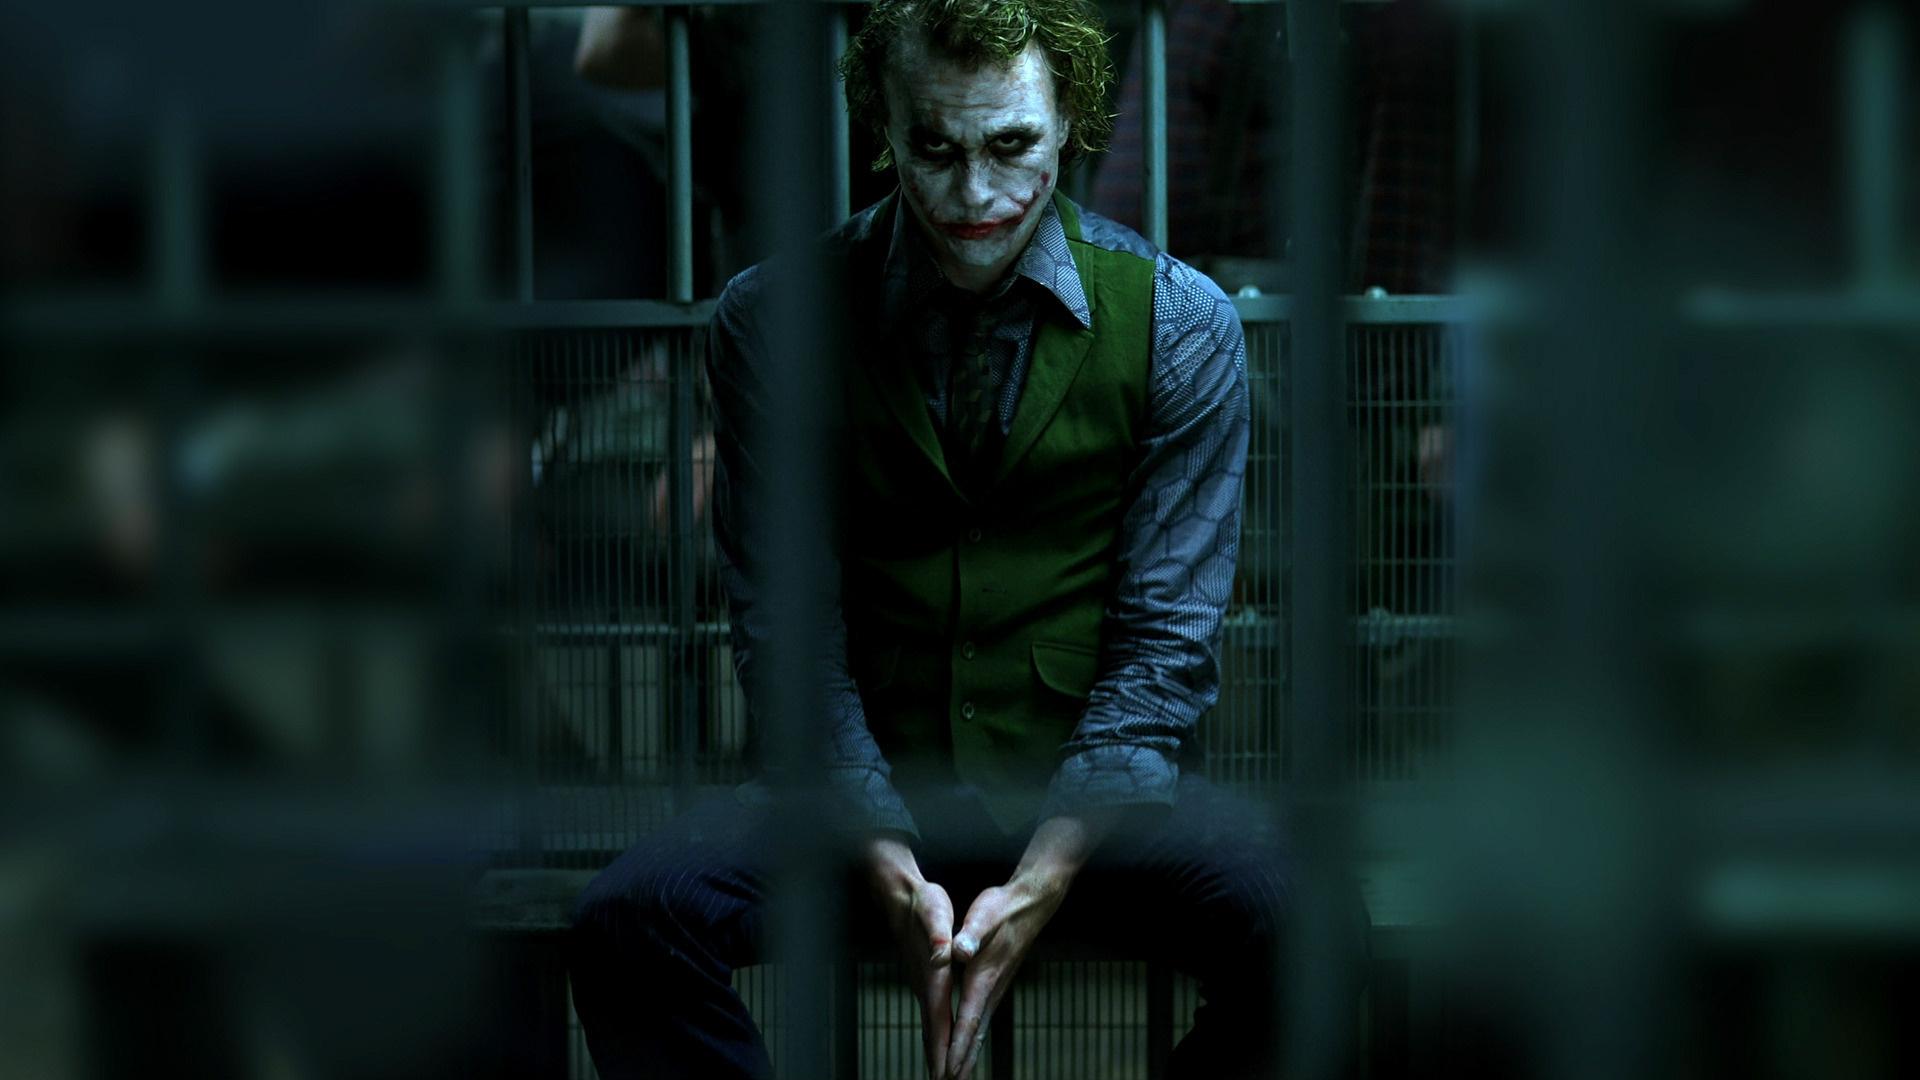 Joker Wallpaper Dark Knight Hd 1920x1080